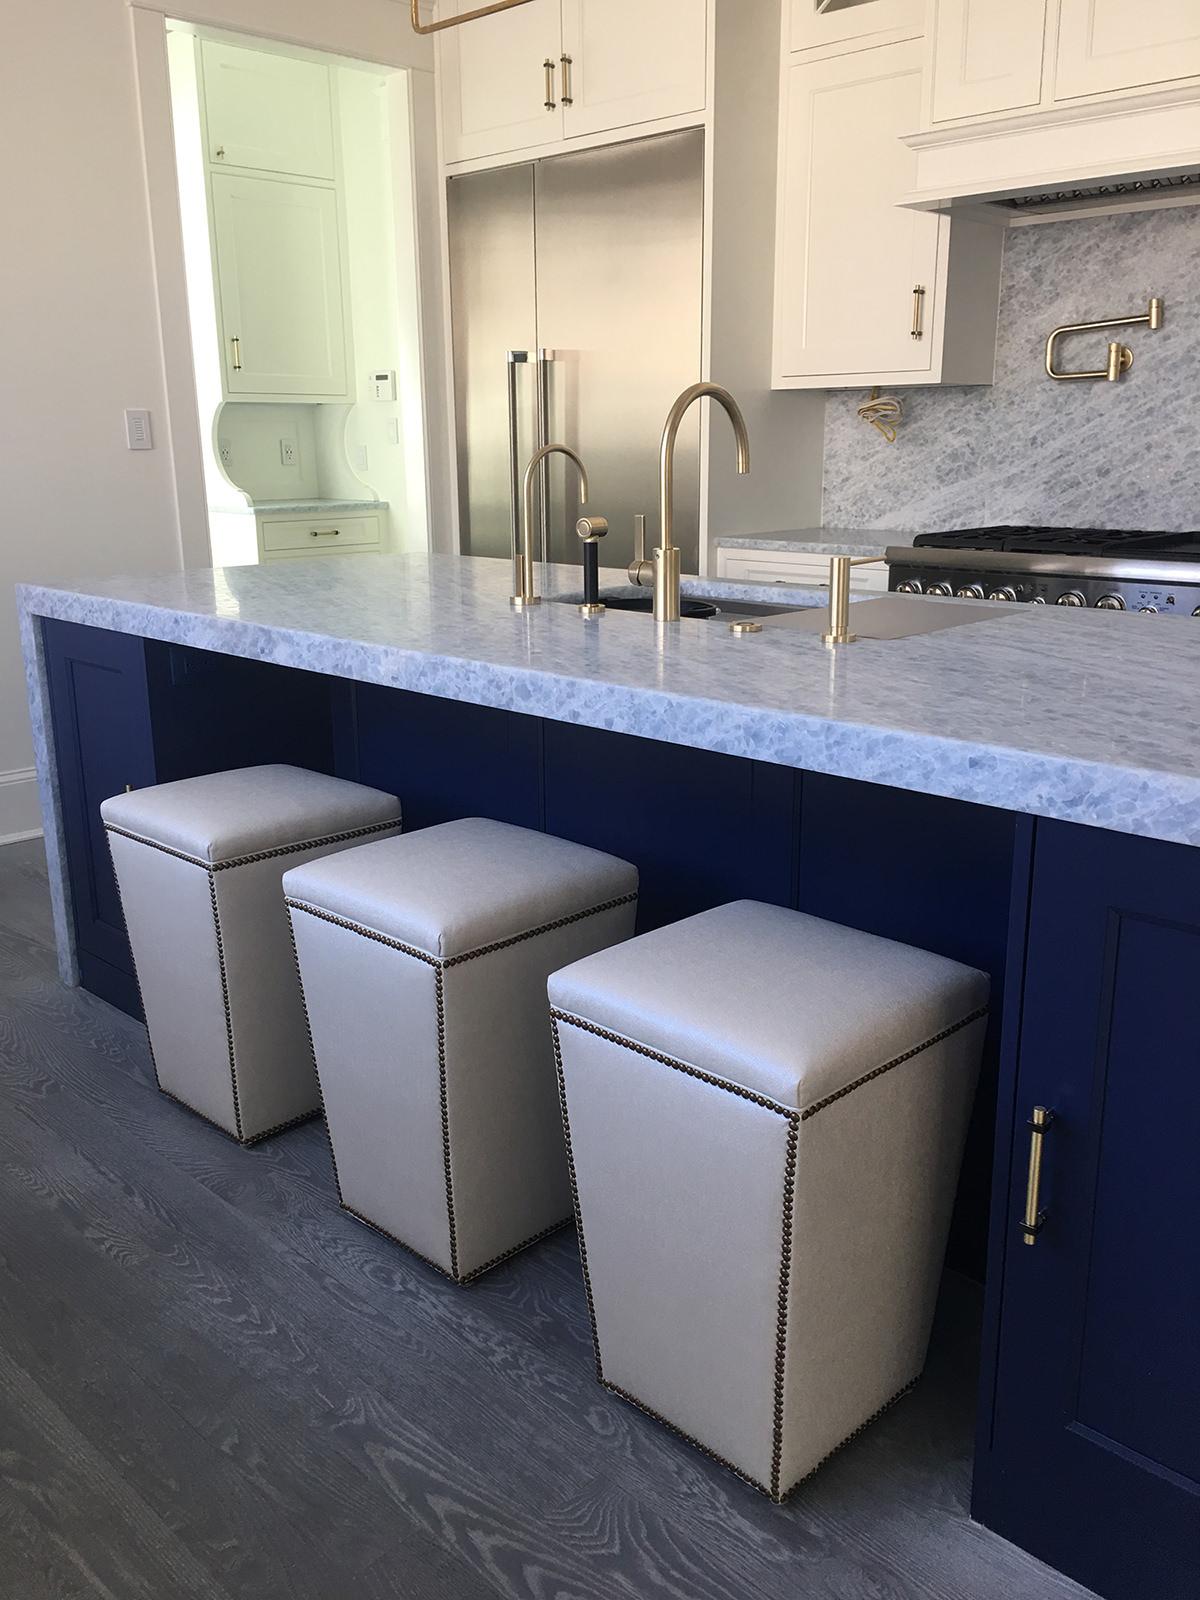 bethesda-maryland-kitchen-remodel-stools-interior-design-montgomery-home.jpg